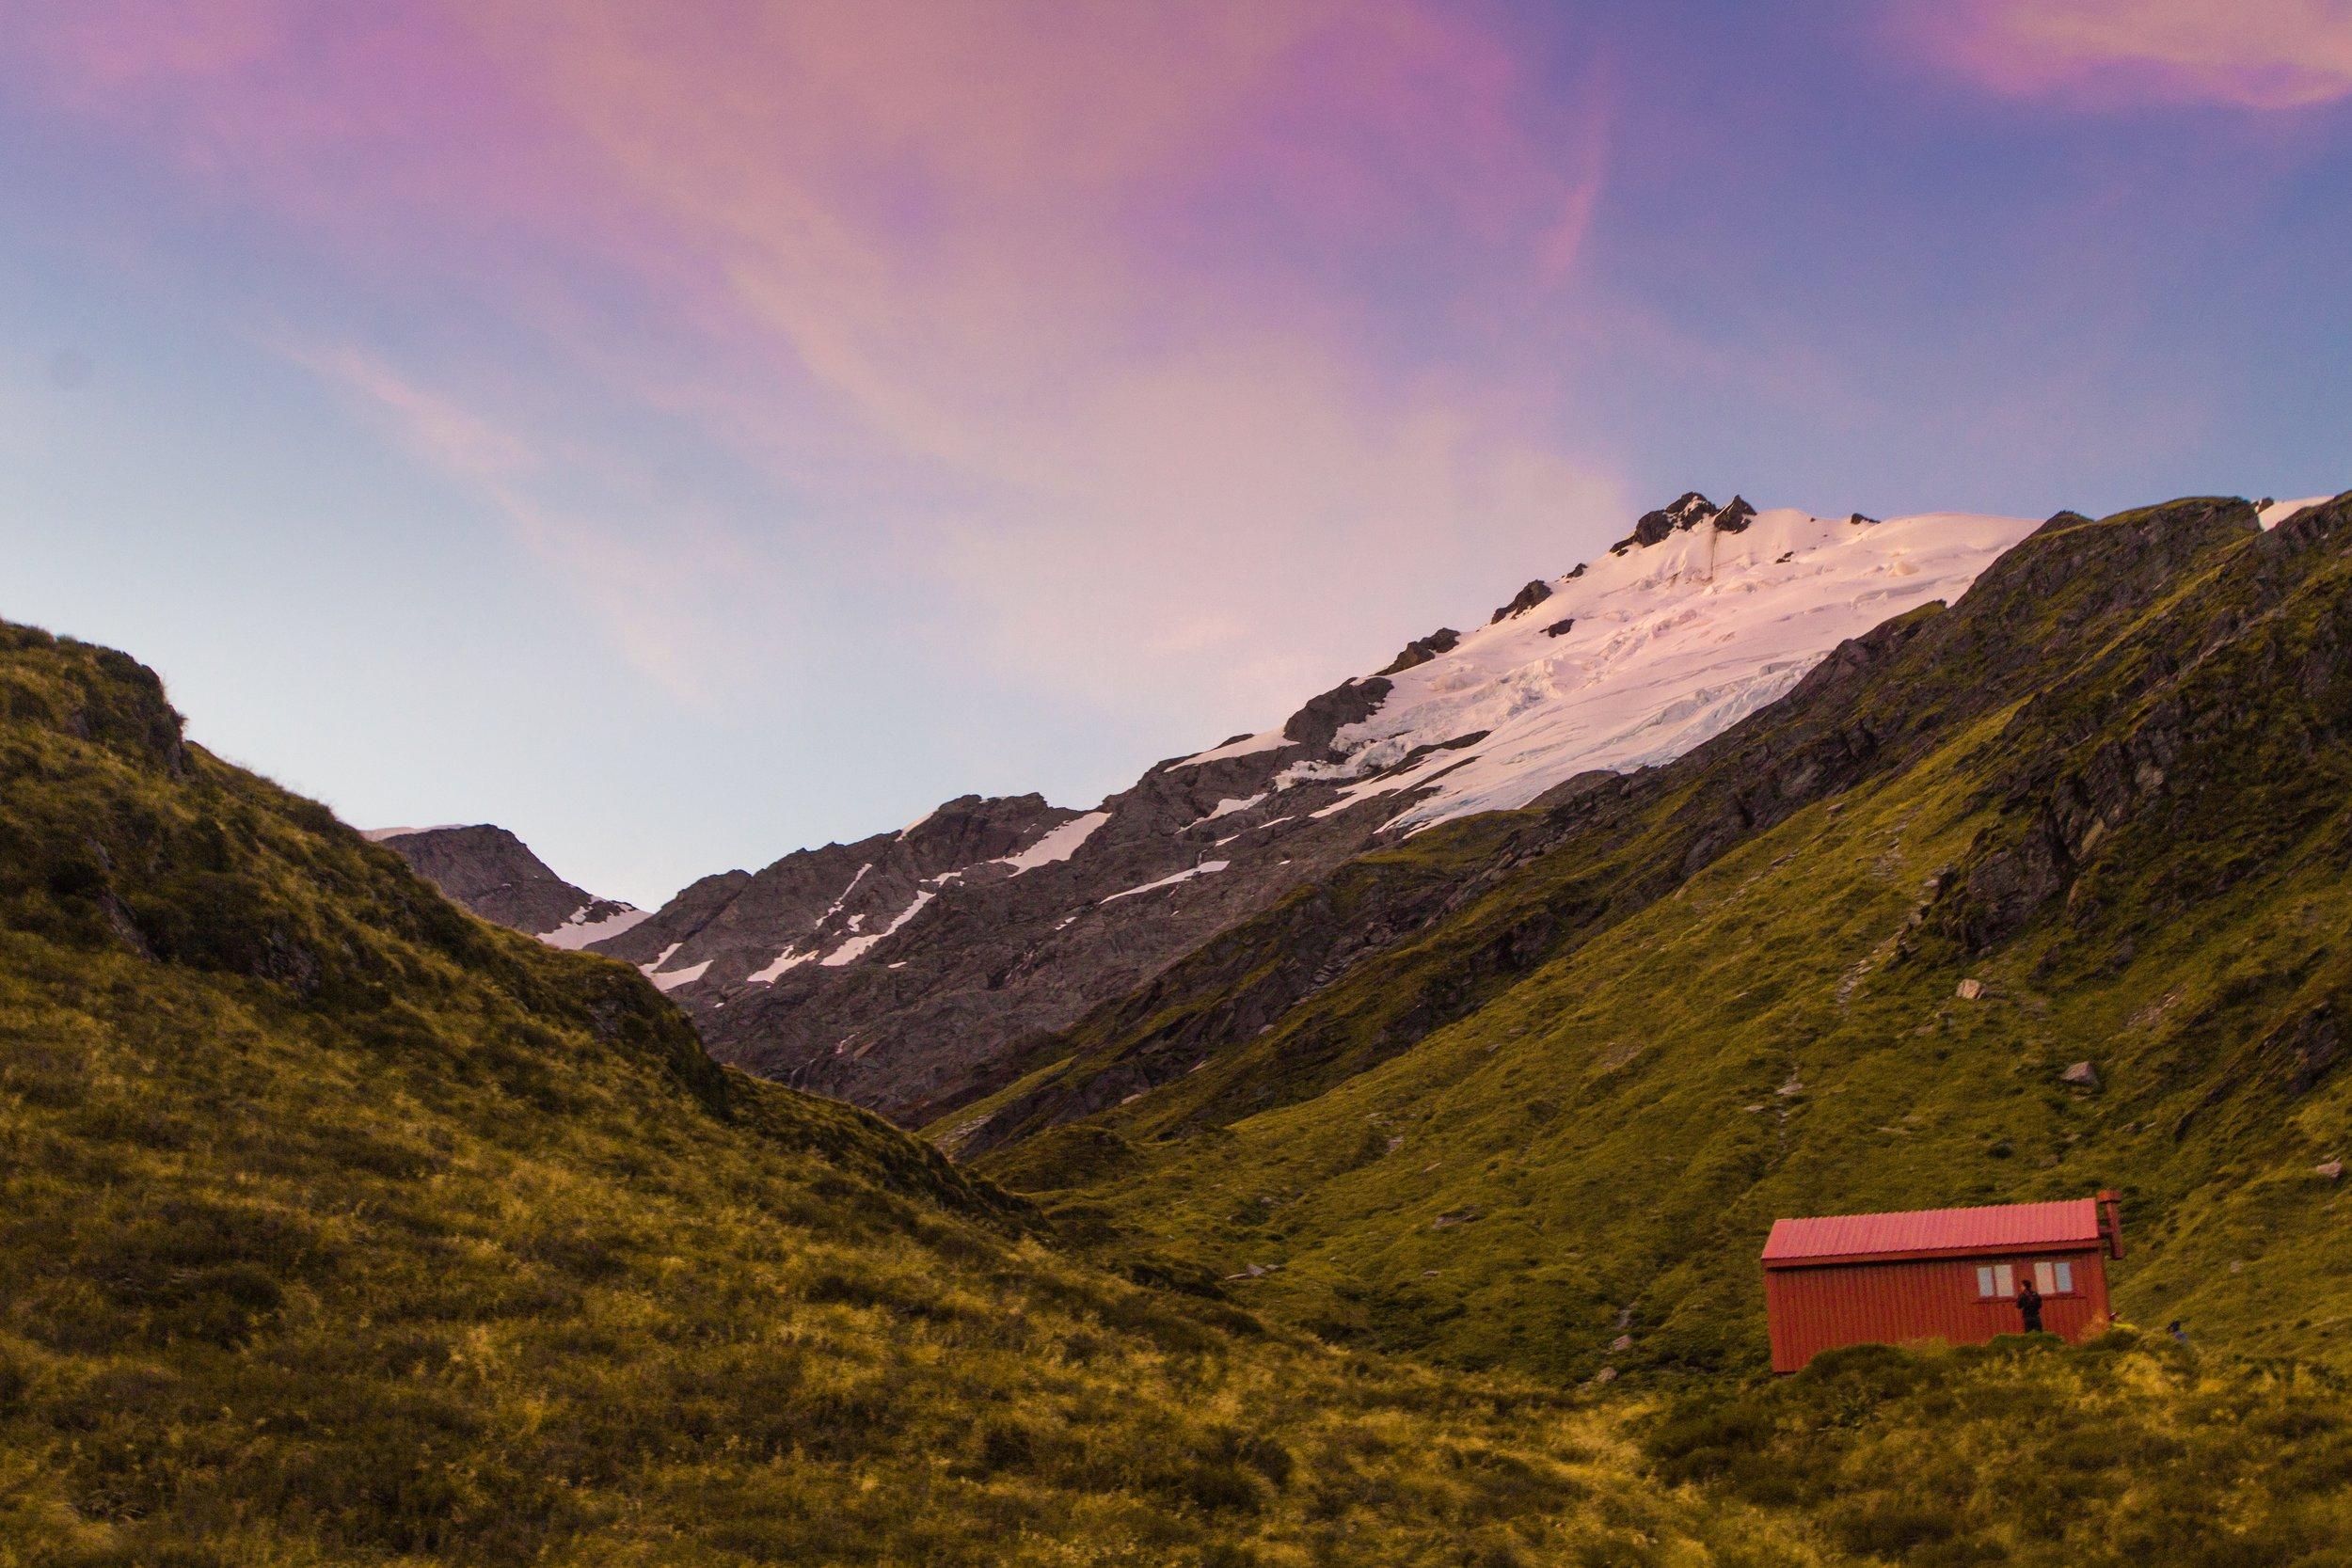 Liverpool Hut, New Zealand, Mt Aspiring National Park